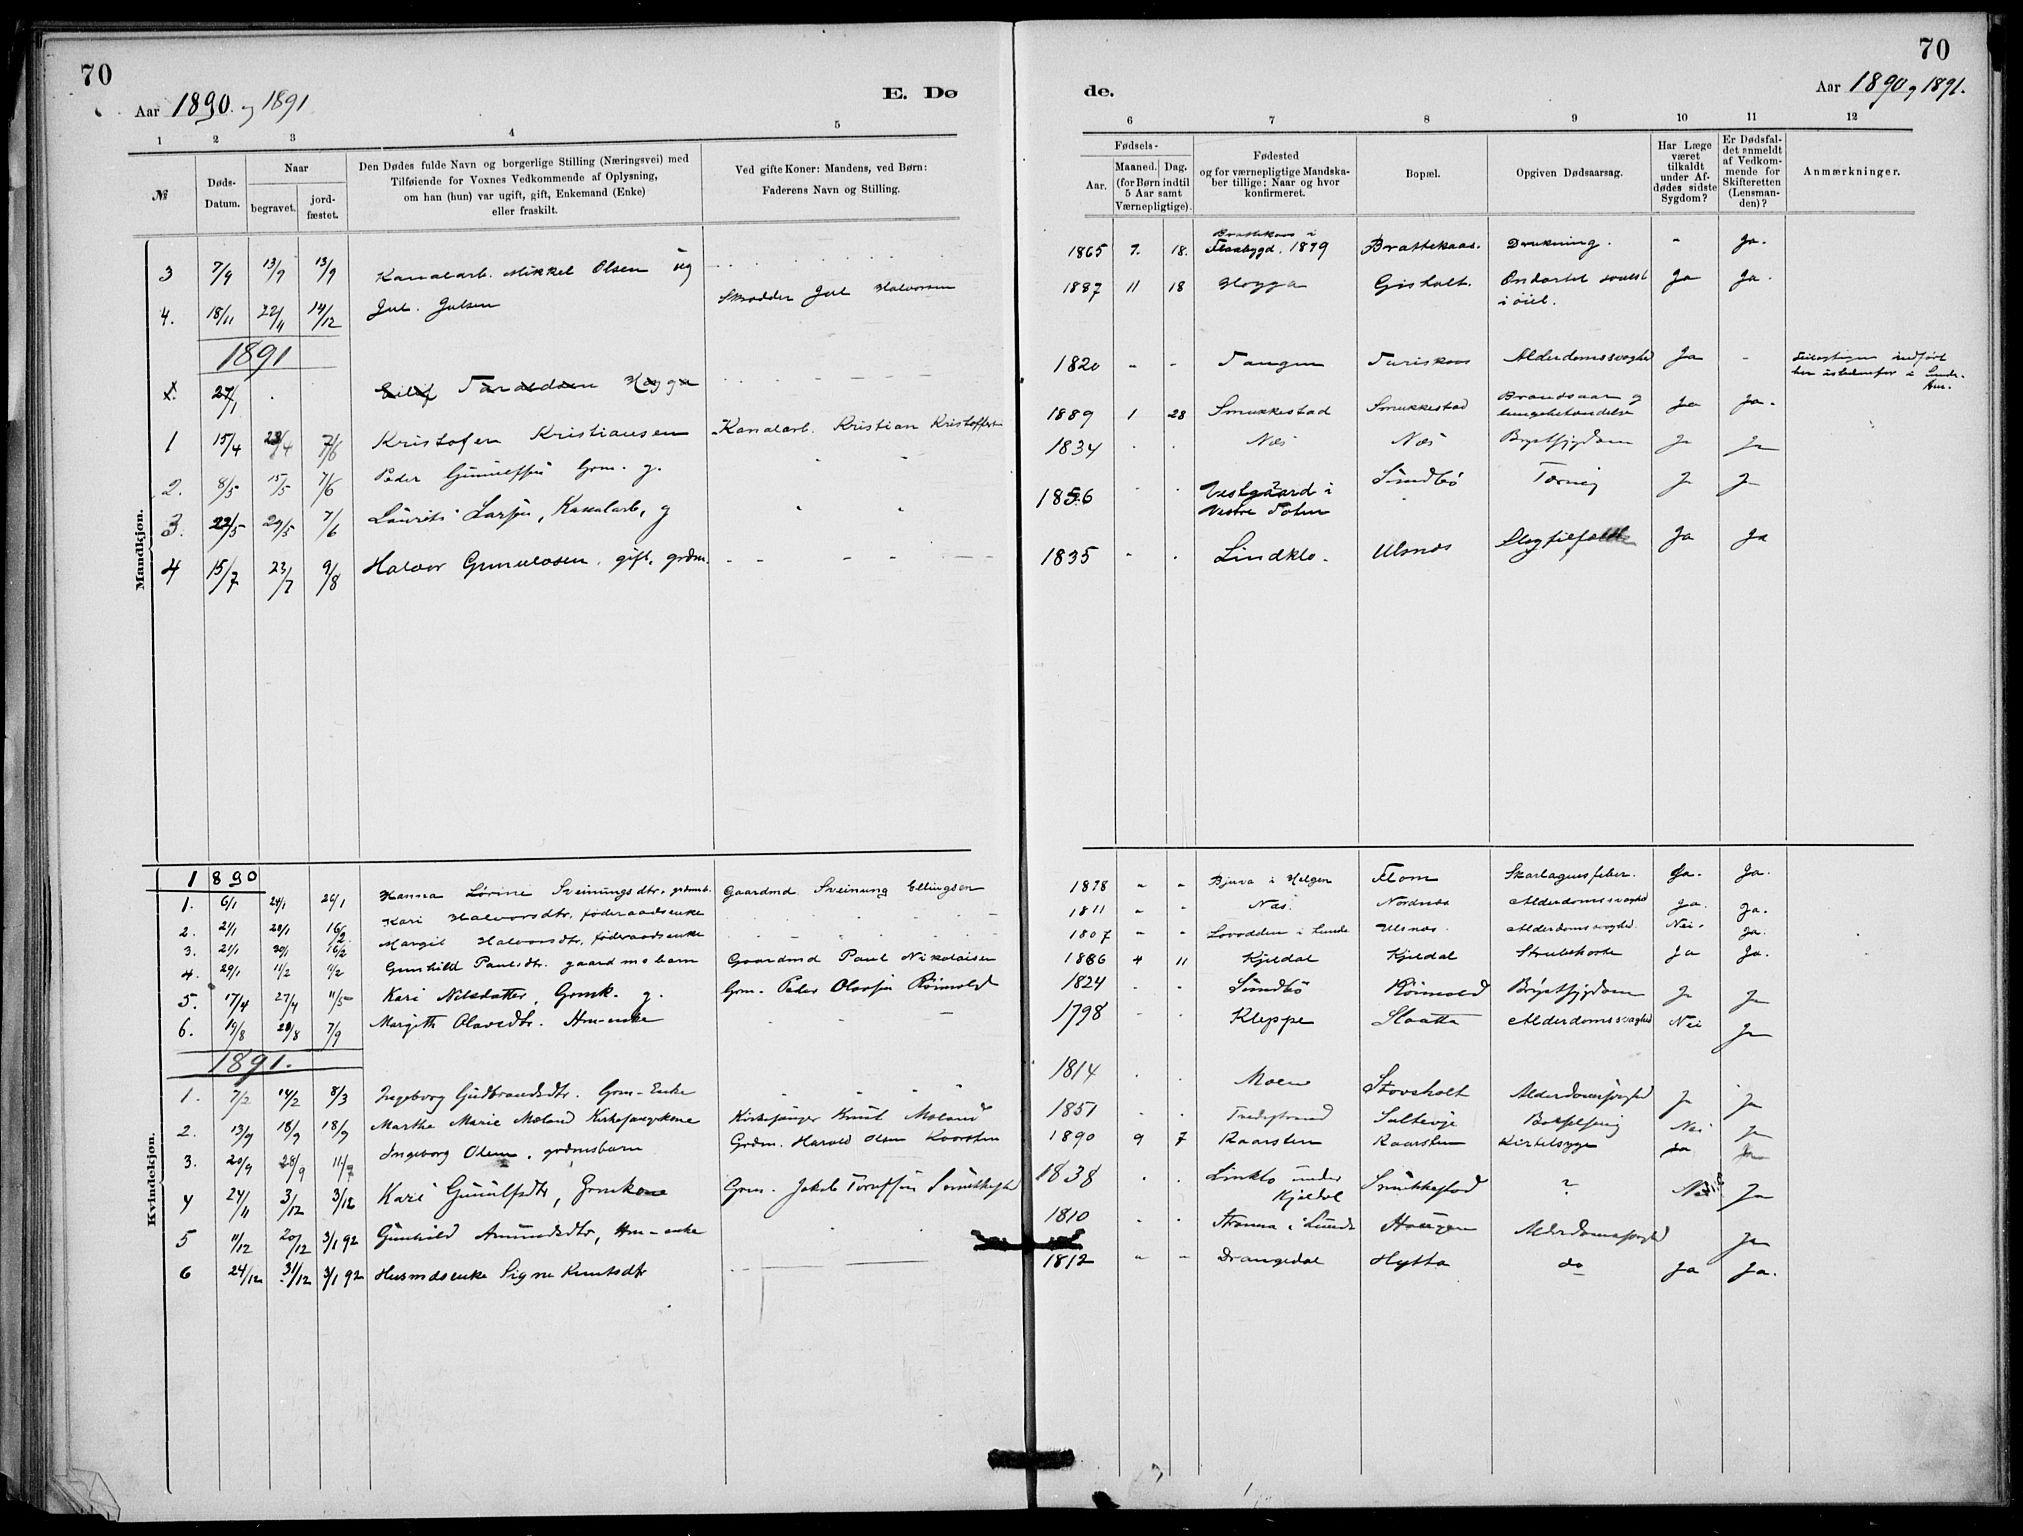 SAKO, Lunde kirkebøker, F/Fb/L0003: Ministerialbok nr. II 3, 1882-1891, s. 70